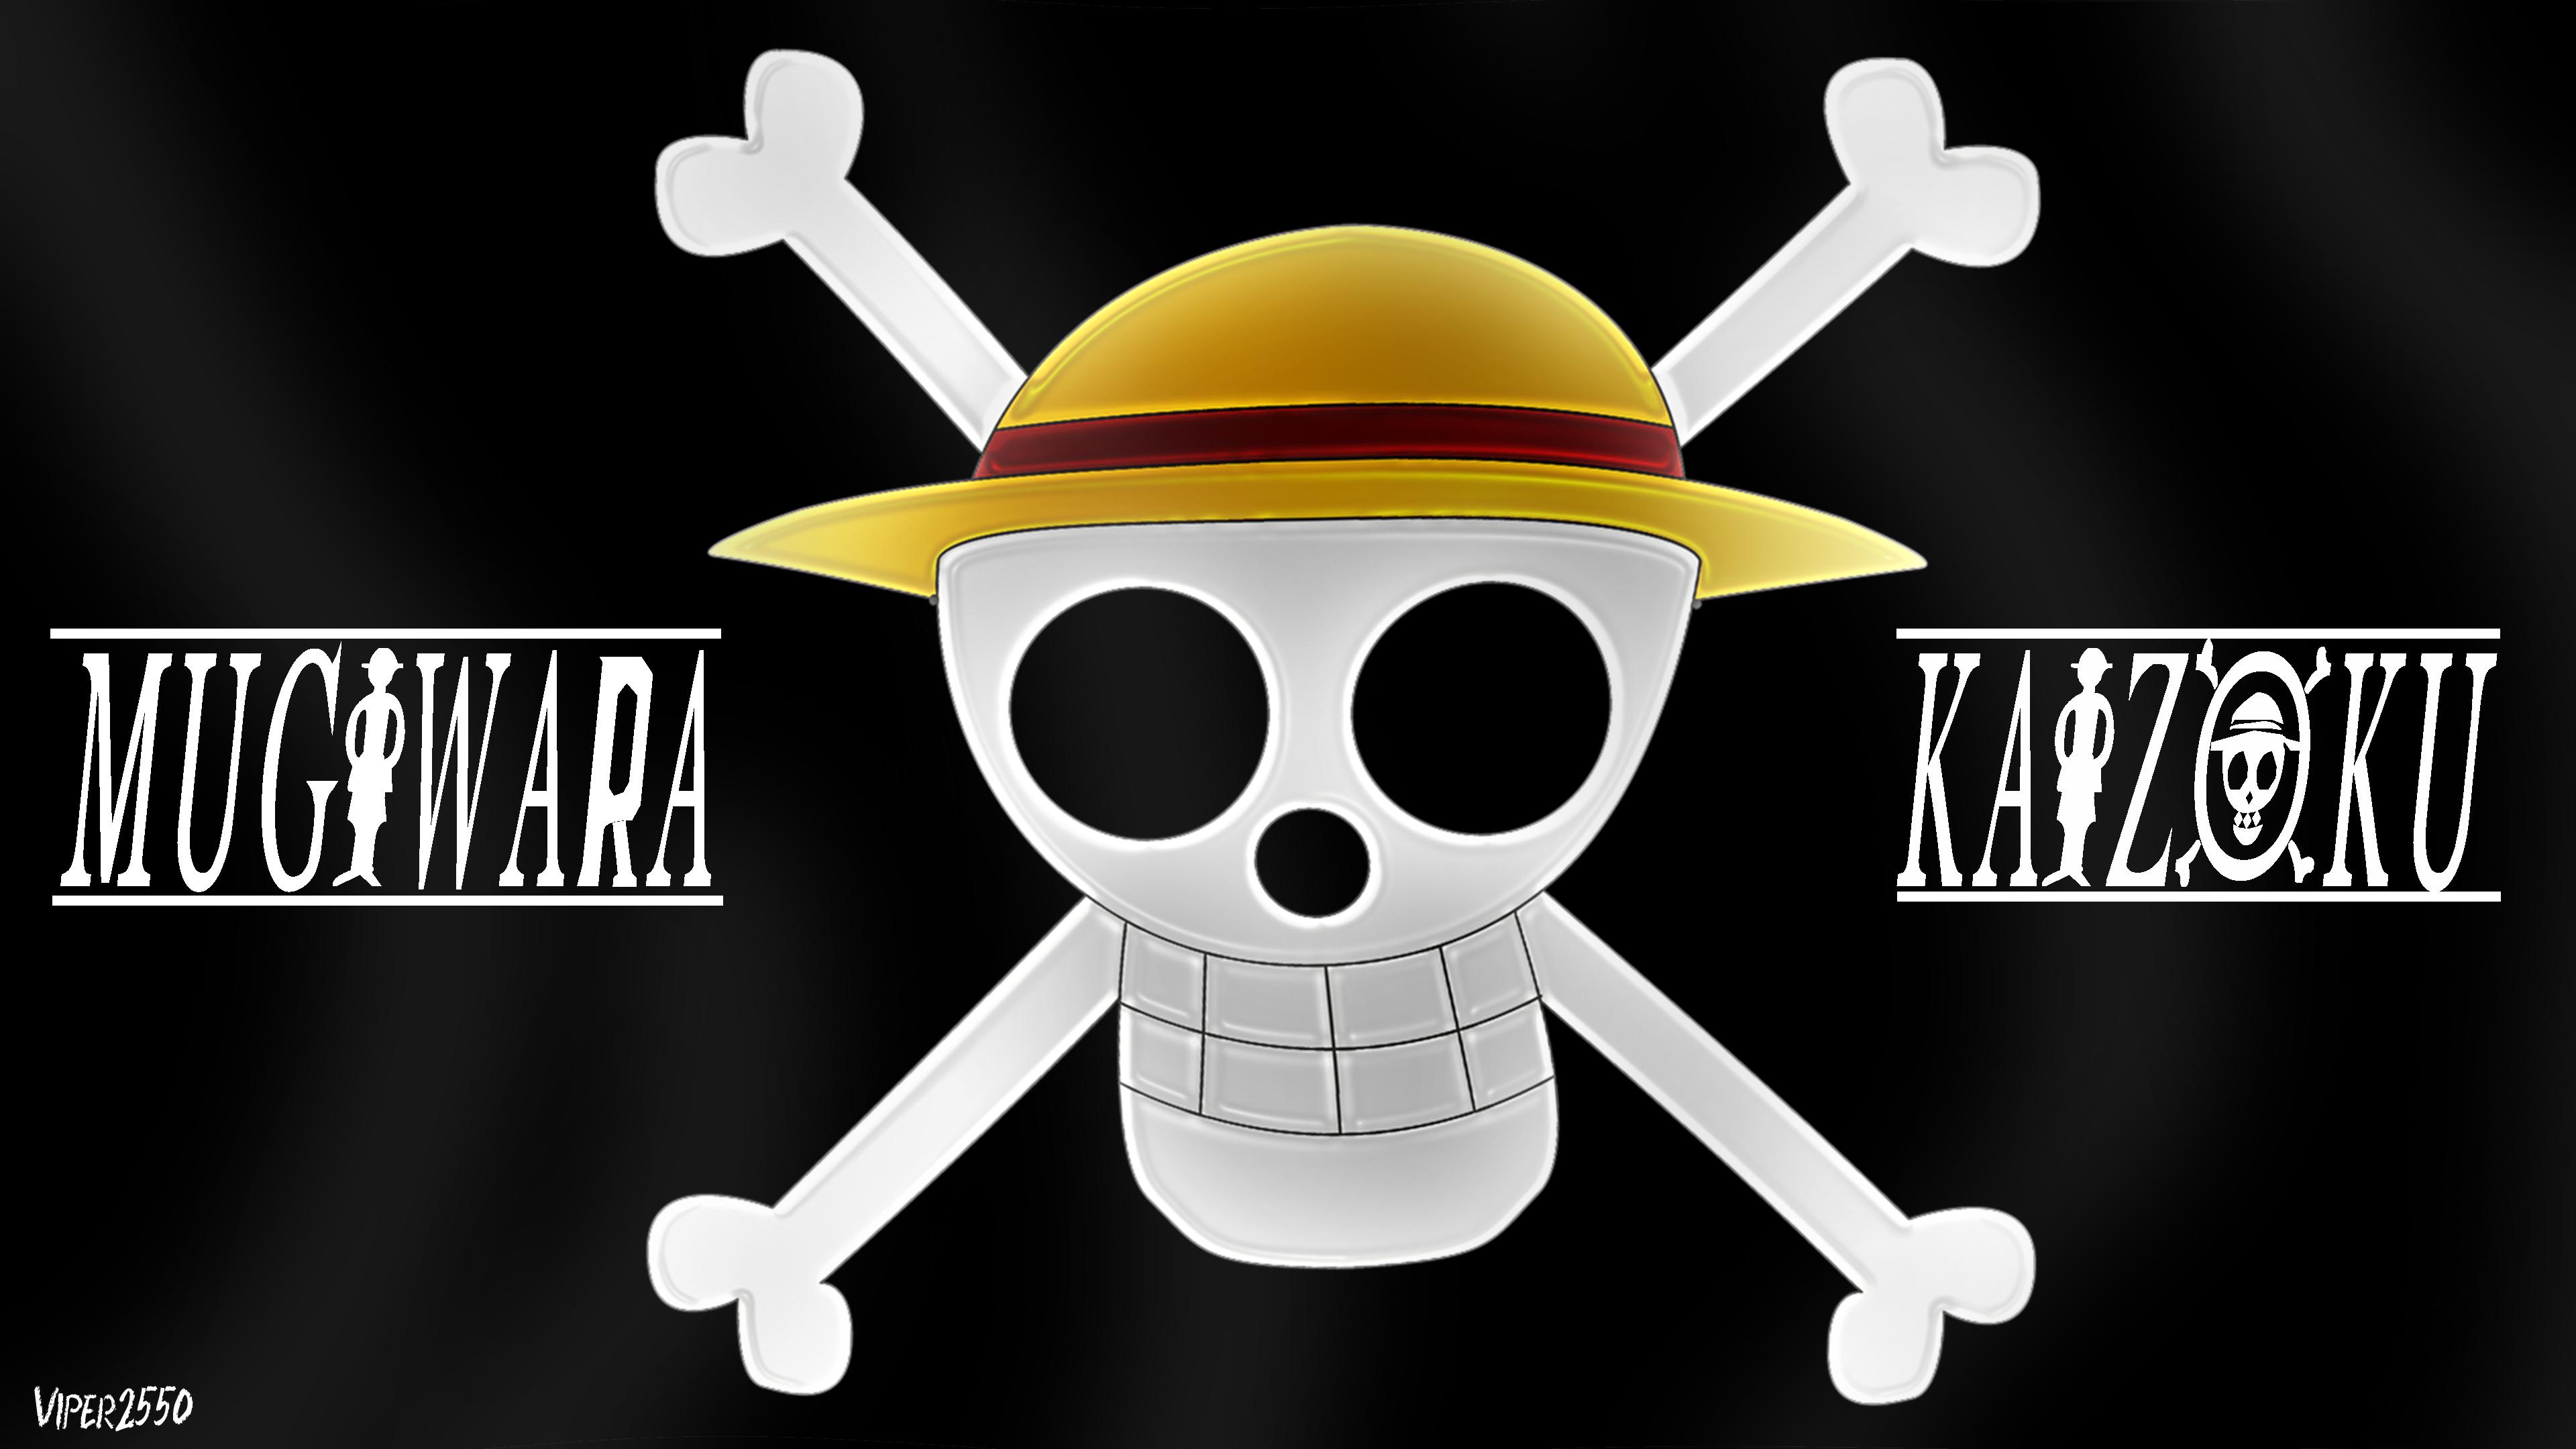 Arabella Drummond Pirate Images Crazy Gallery 3840x2160